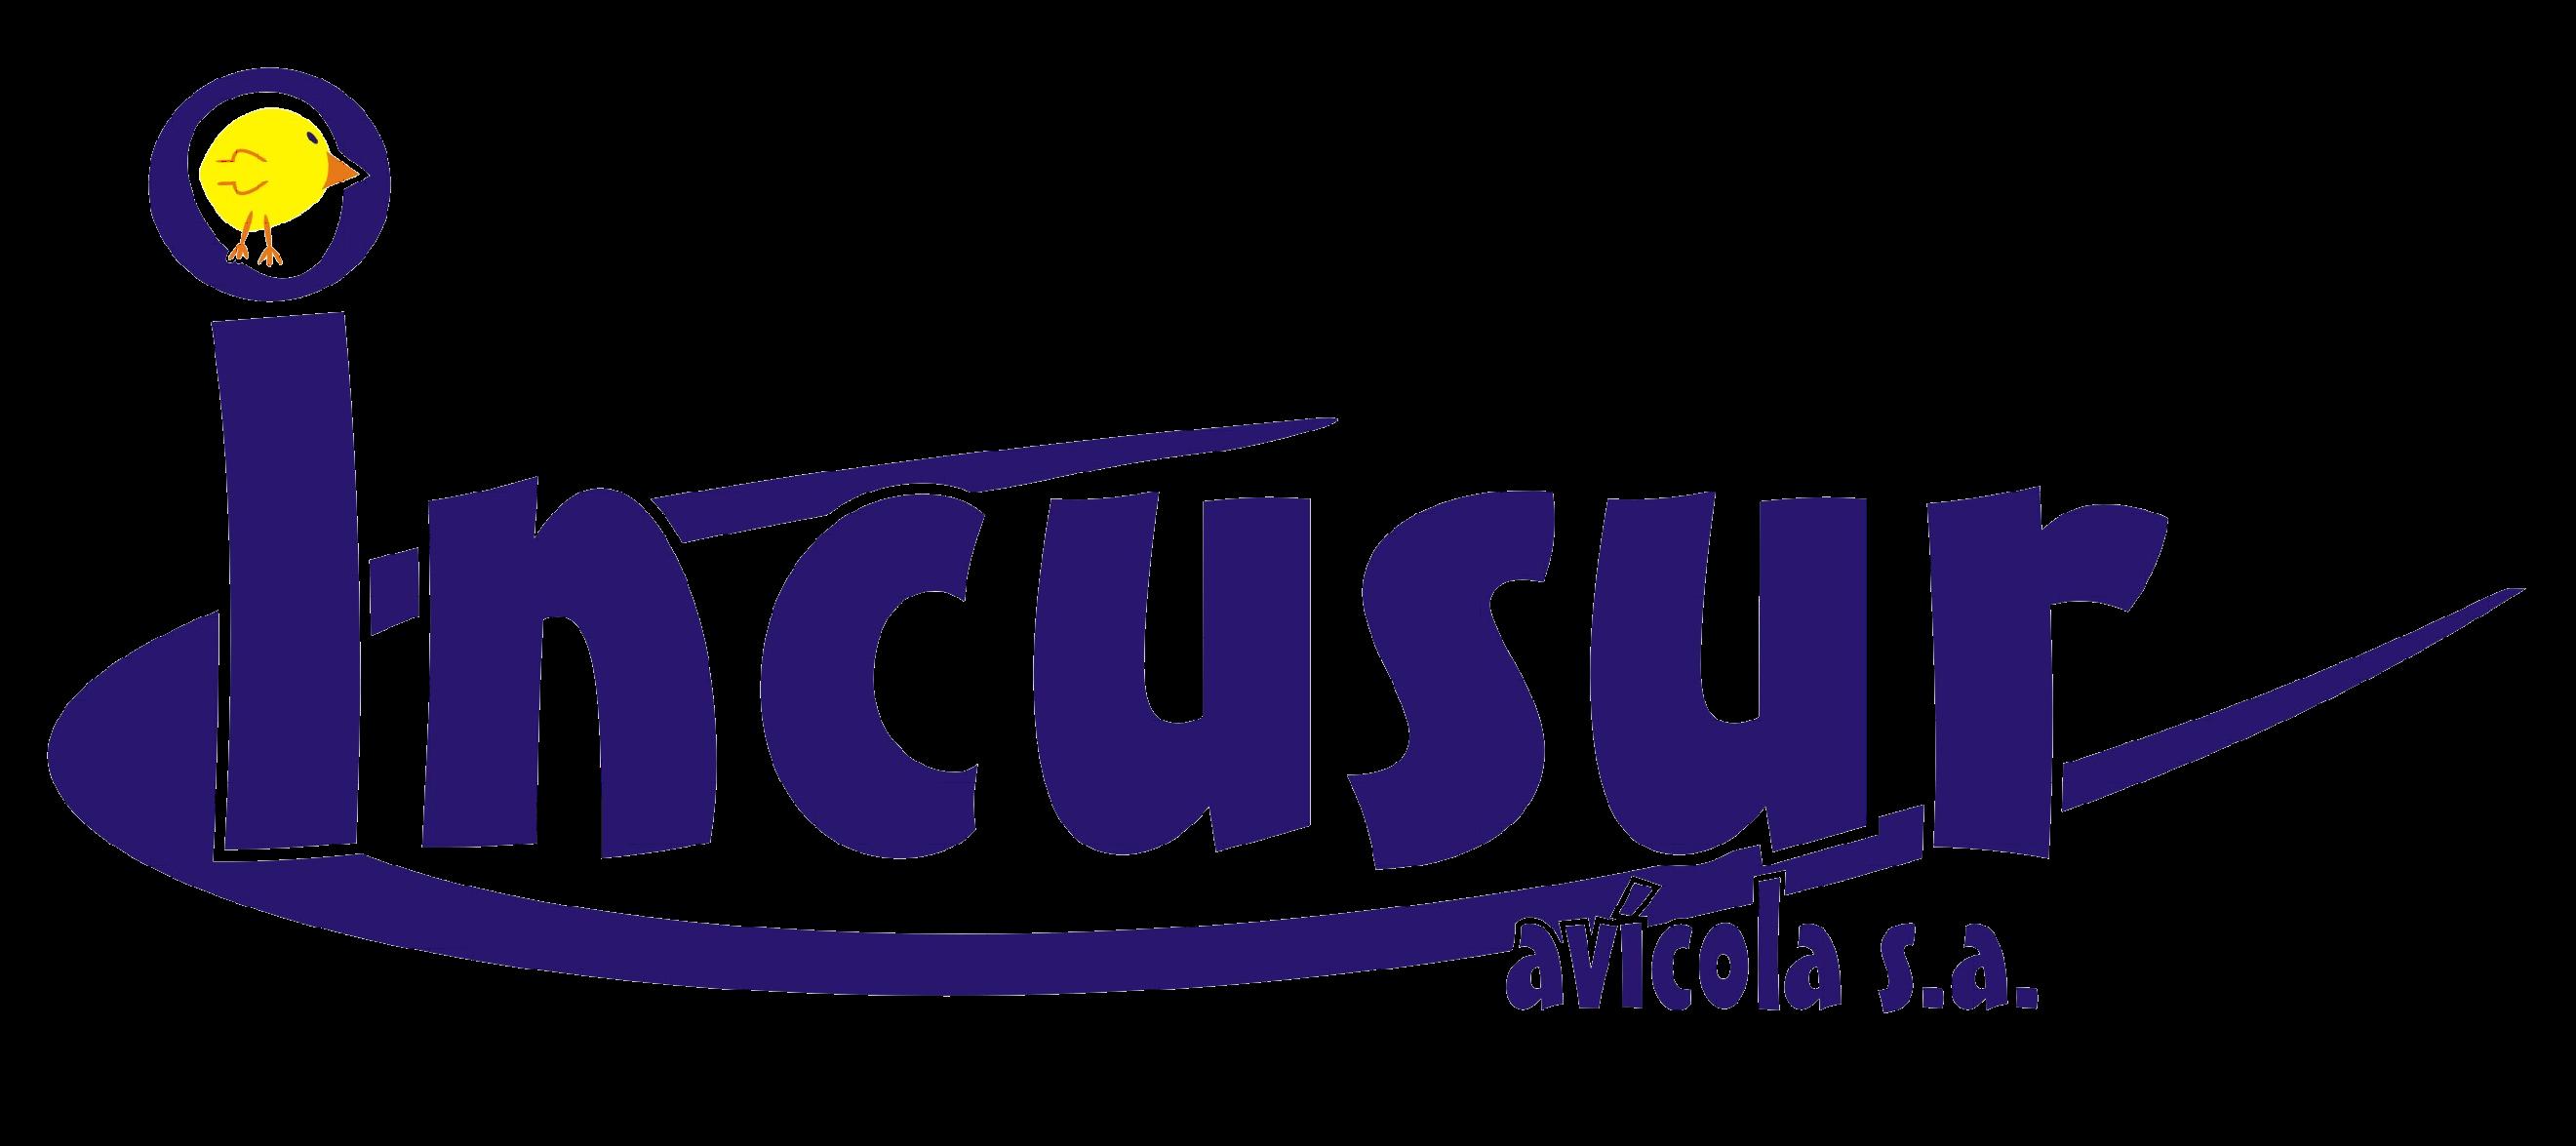 https://serproavi.com/wp-content/uploads/2021/09/Logo-Incusur-sin-fondo.png